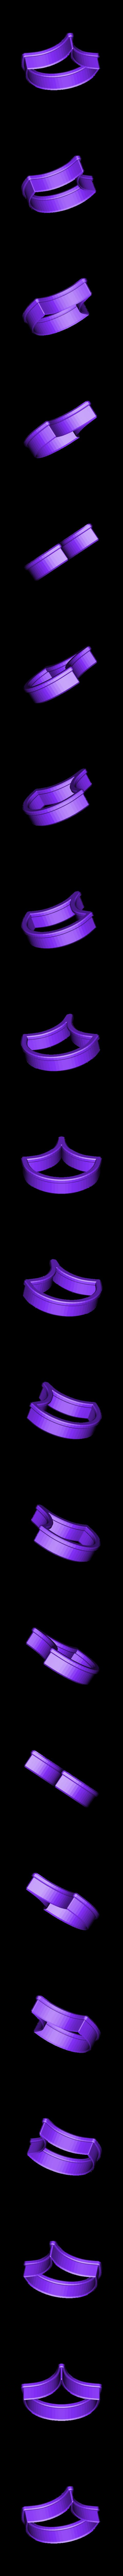 Scale Cookie Cutter.stl Download free STL file Scale Cookie Cutter • 3D print design, 3DBuilder